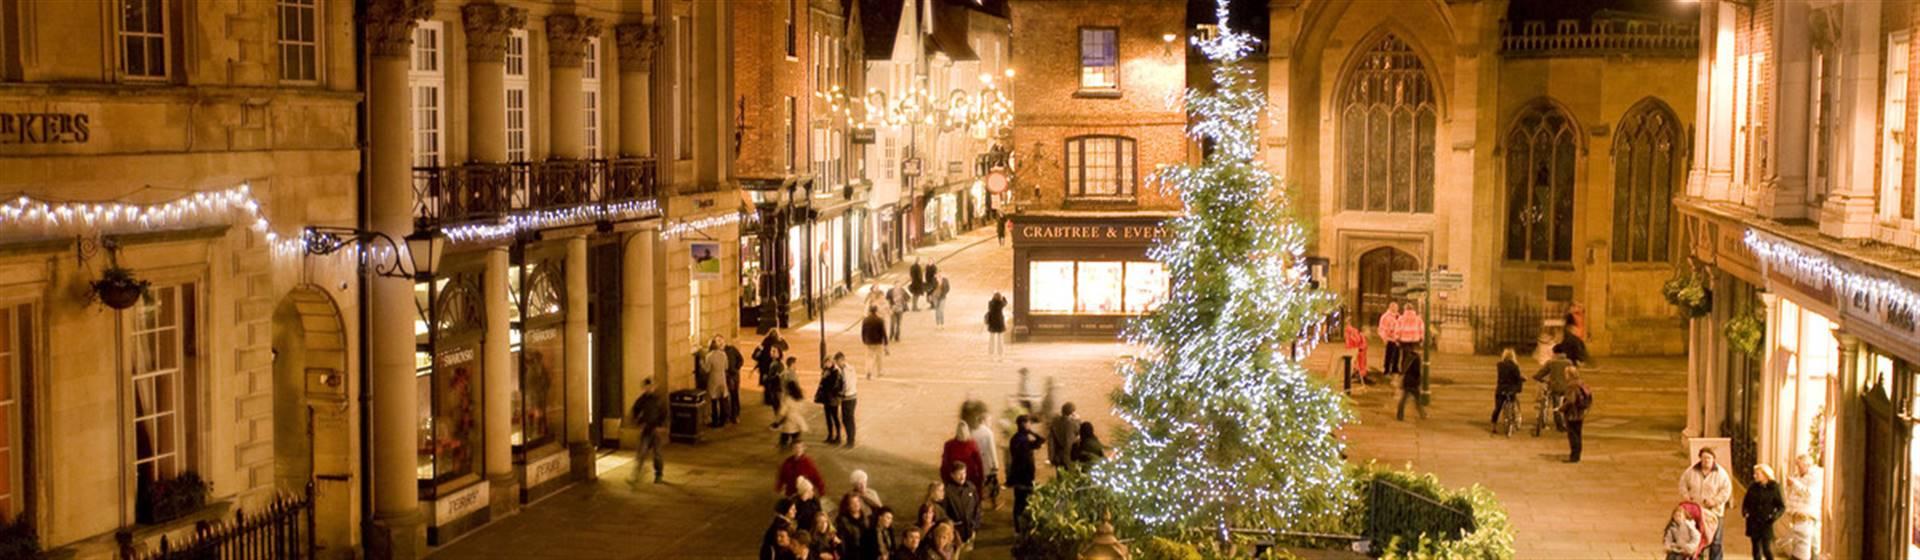 Harrogate & York At Christmas - Sunday Special